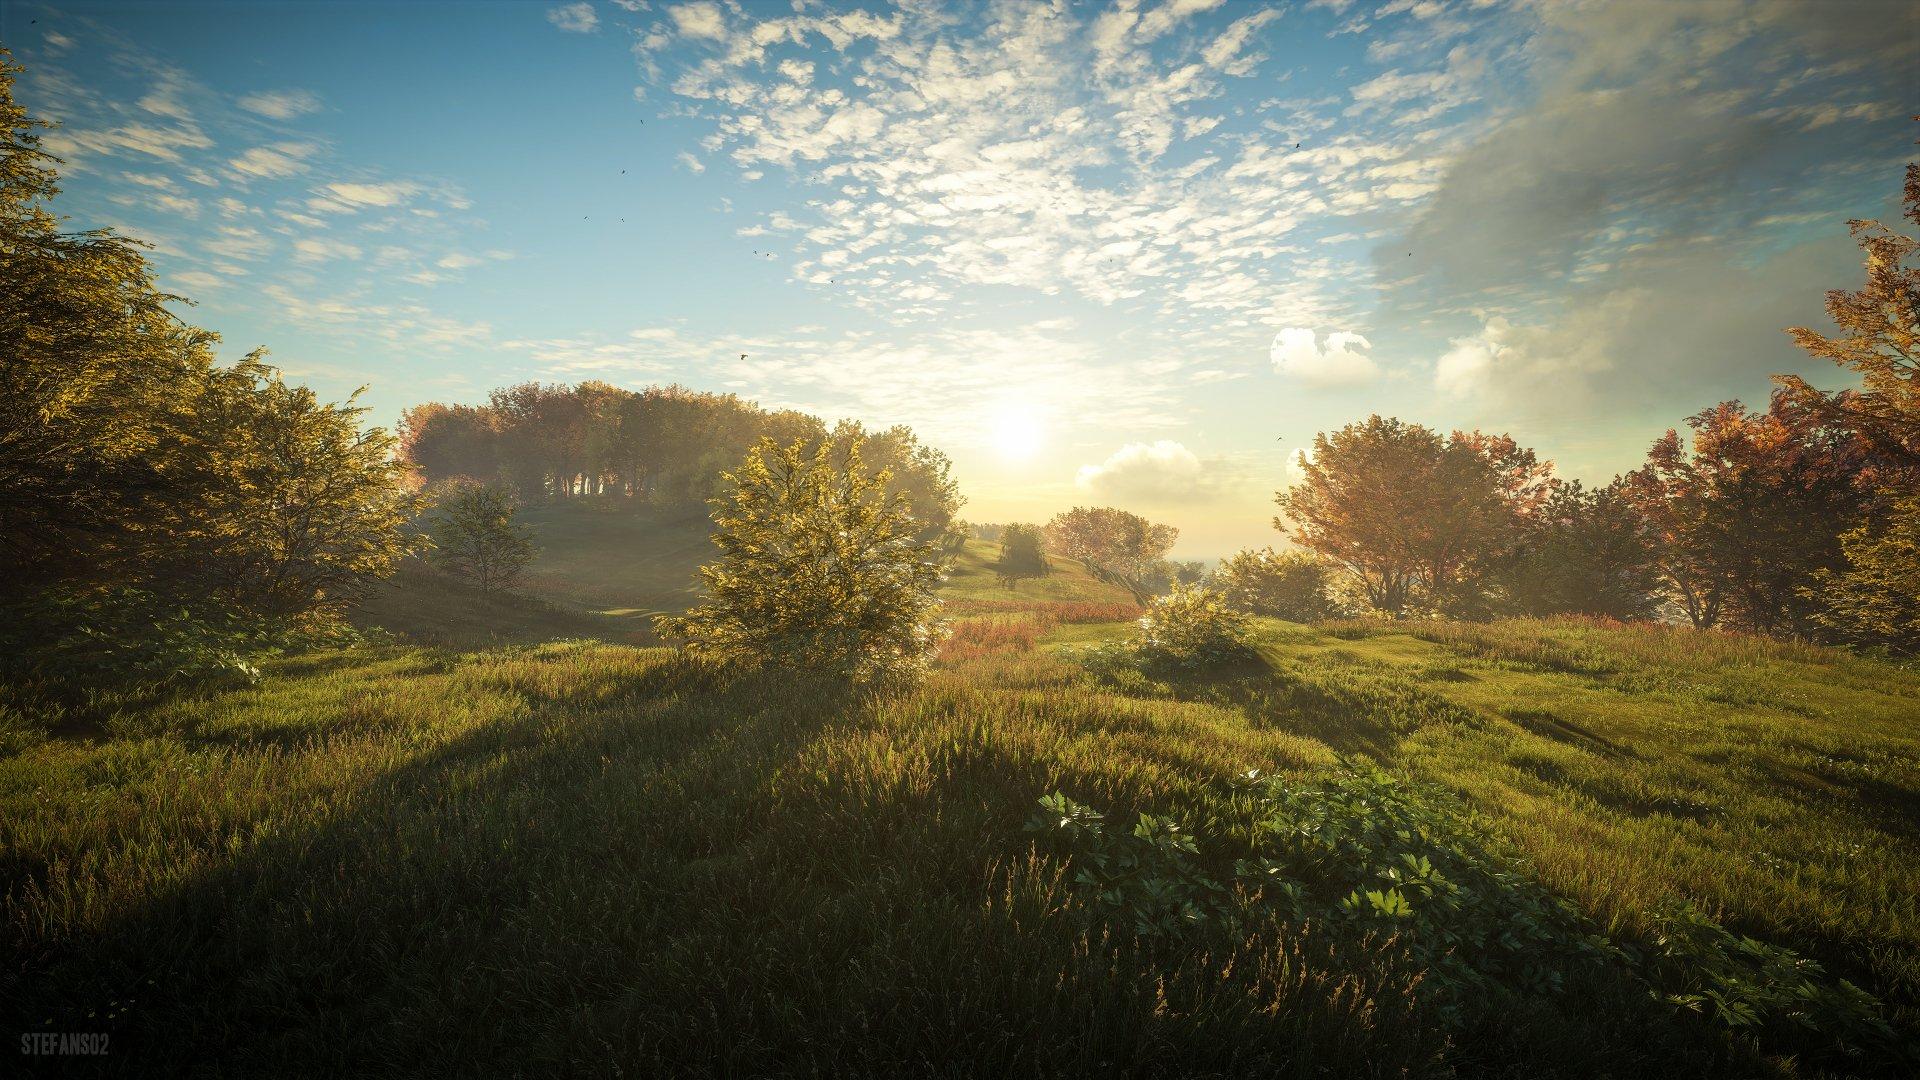 TheHunter: Call Of The Wild / Morning Sun 4k Ultra HD